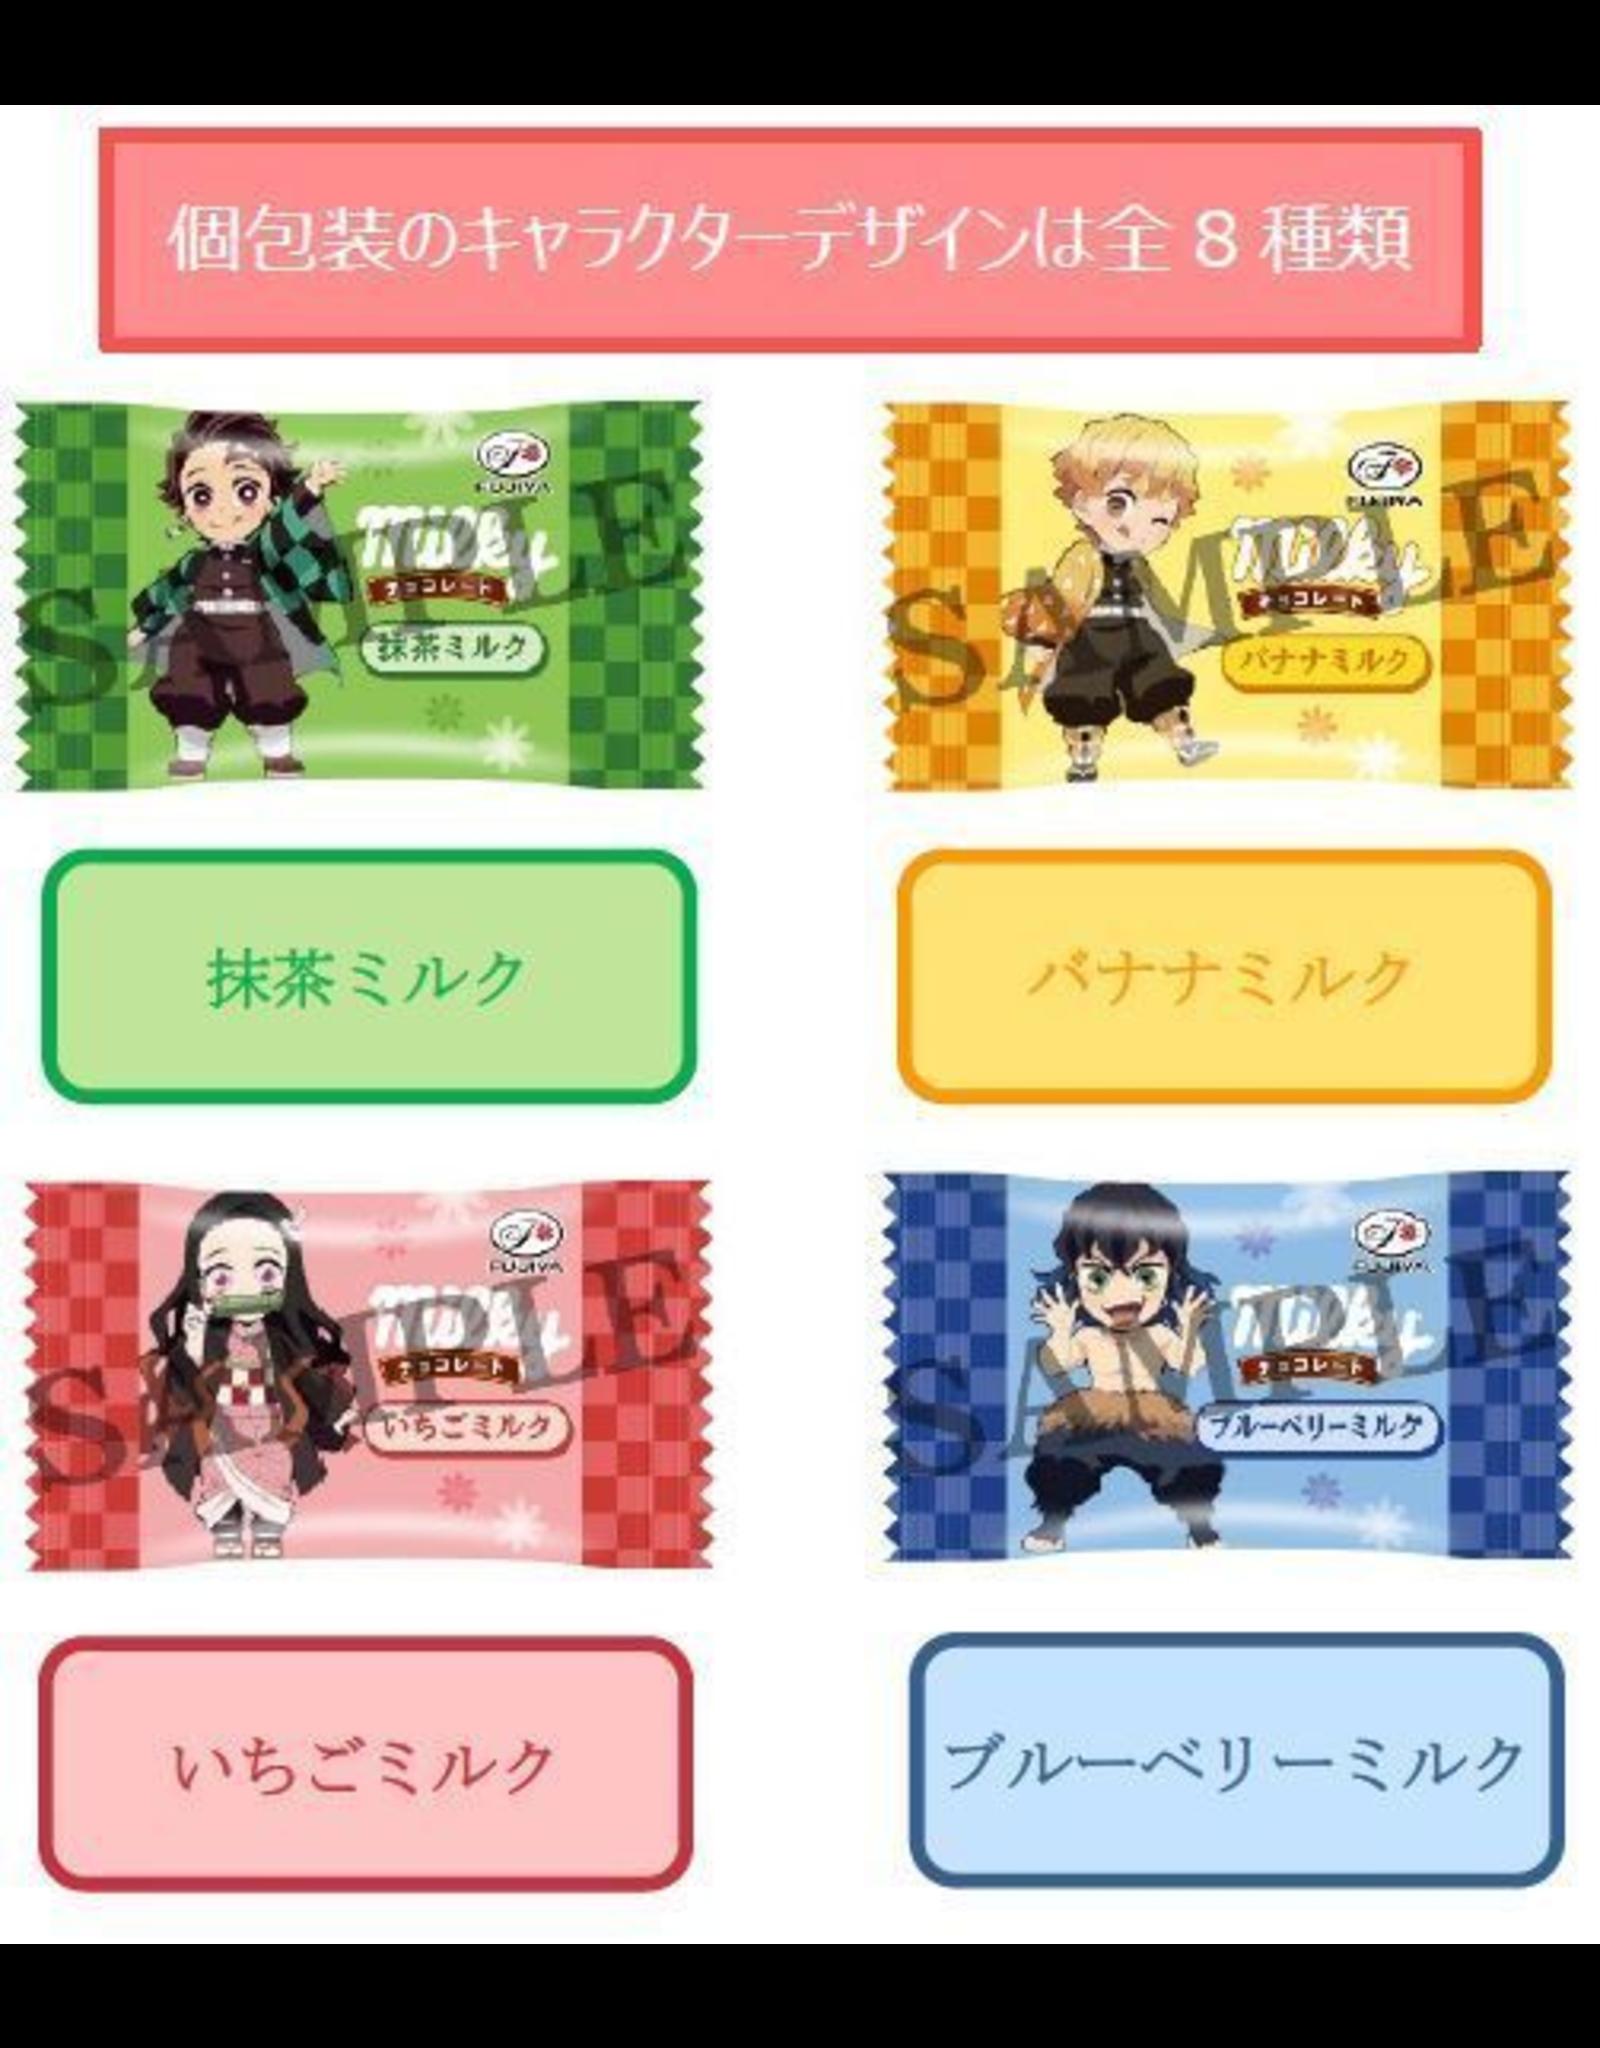 Milky x Demon Slayer: Kimetsu no Yaiba - Flavored Chocolates - 20 pieces - Matcha, Strawberry, Banana, Blueberry